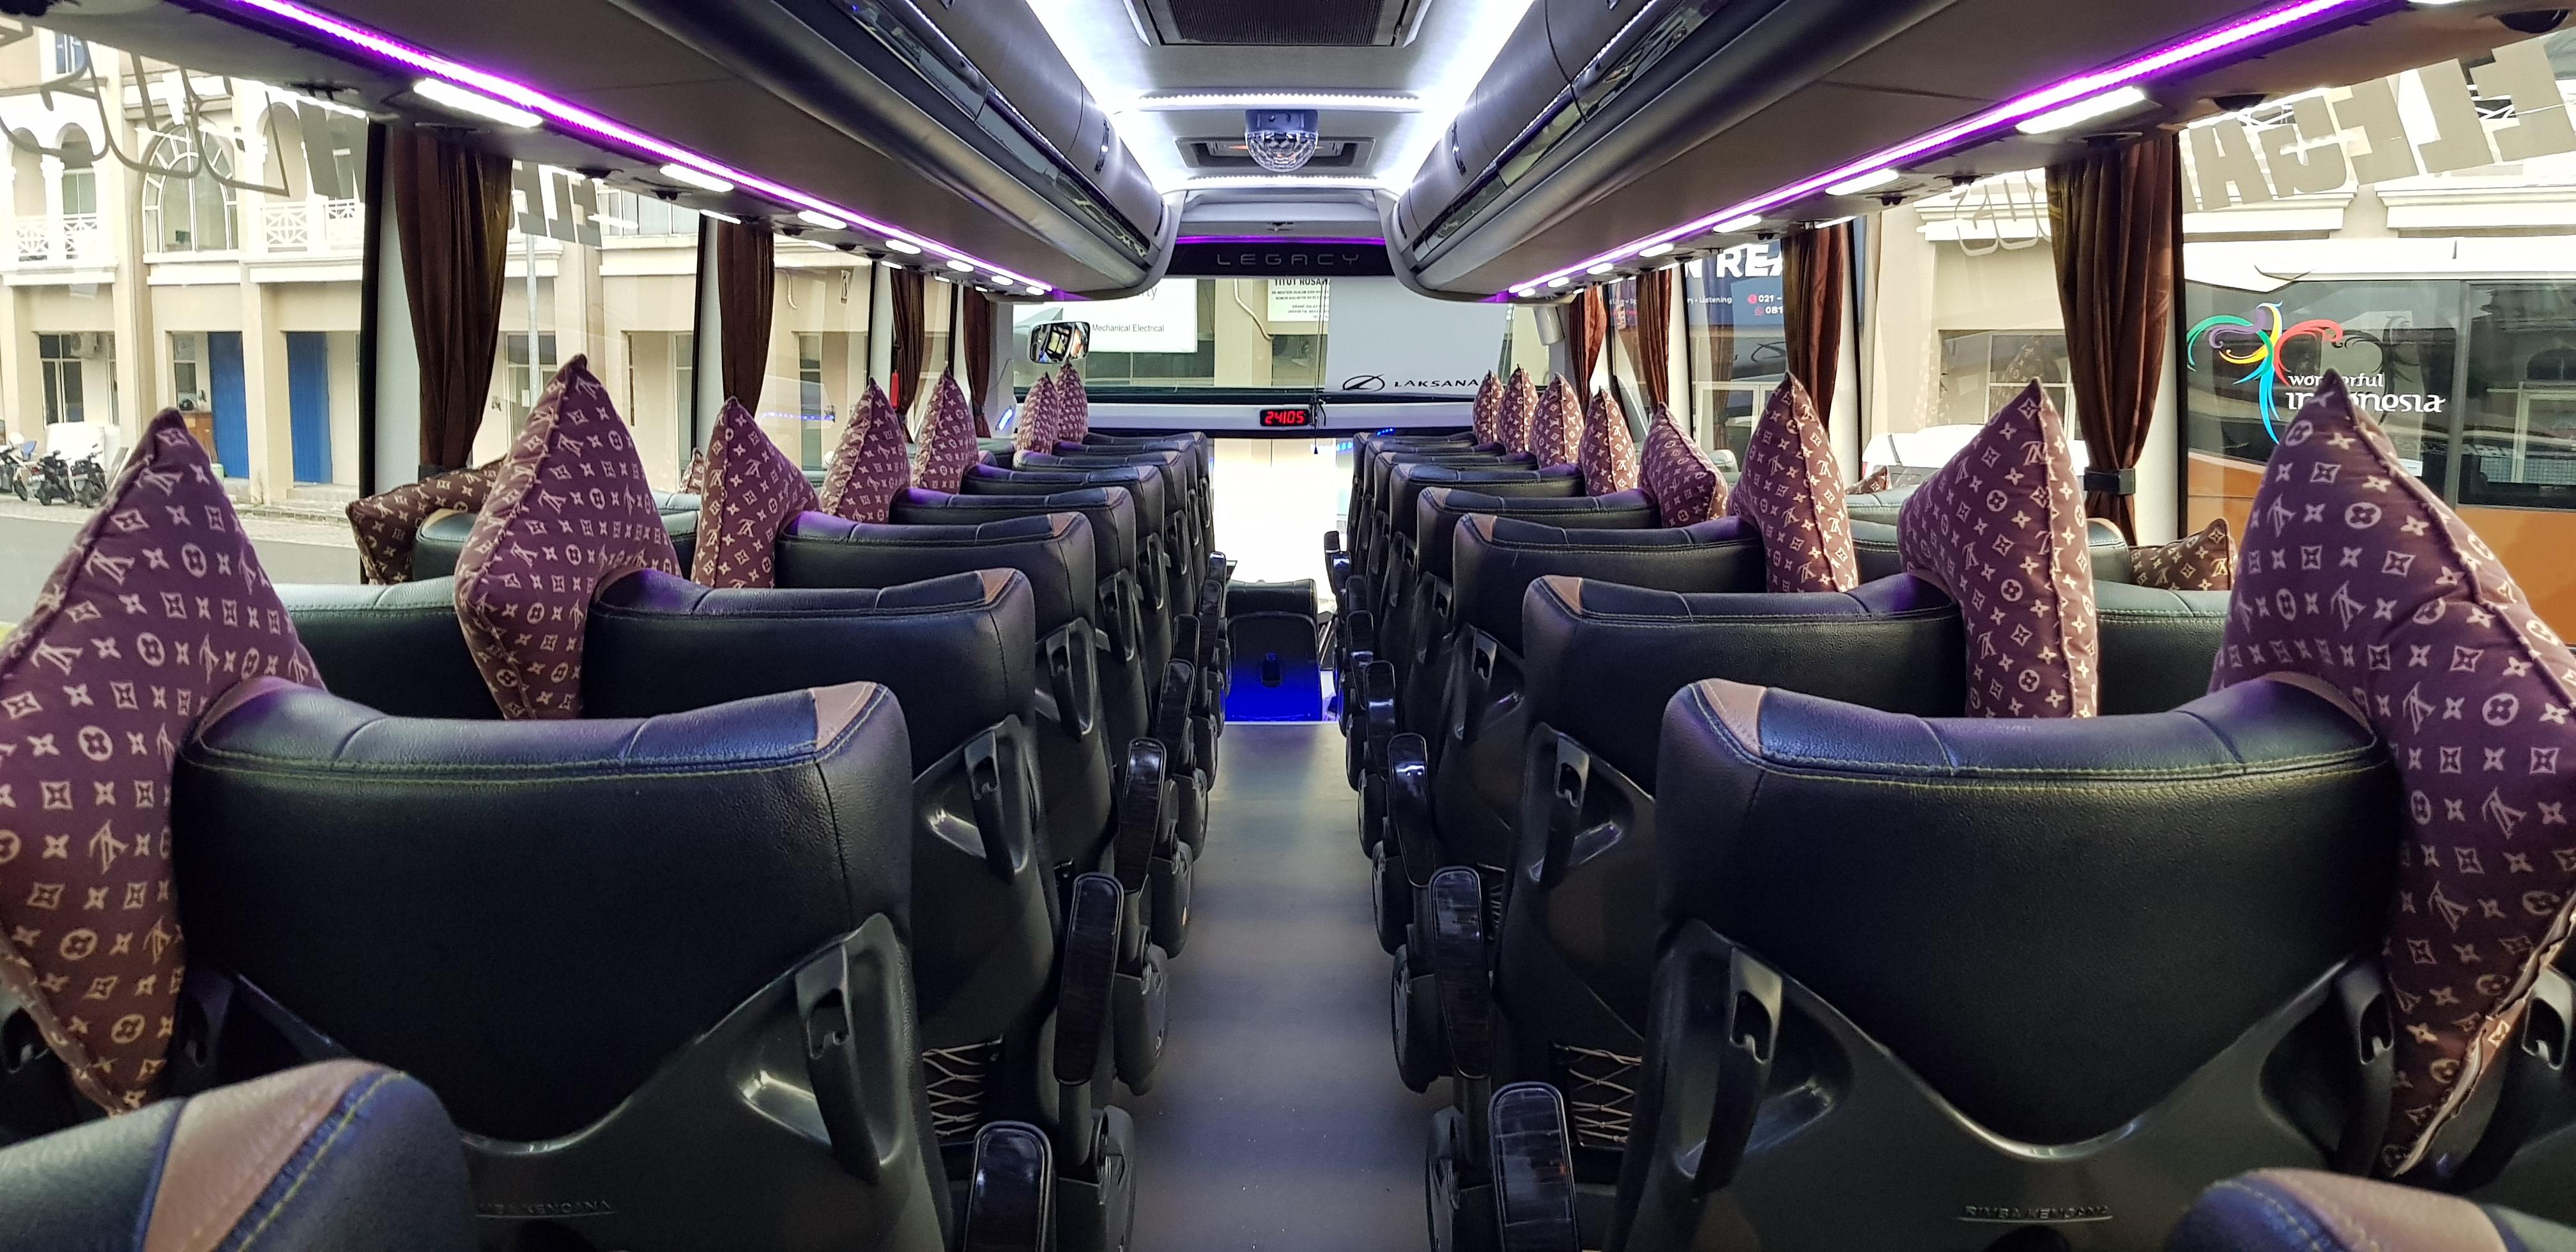 interior bus pariwisata melody transport, harga sewa bus pariwisata termurah di jakarta, bekasi, depok, tangerang